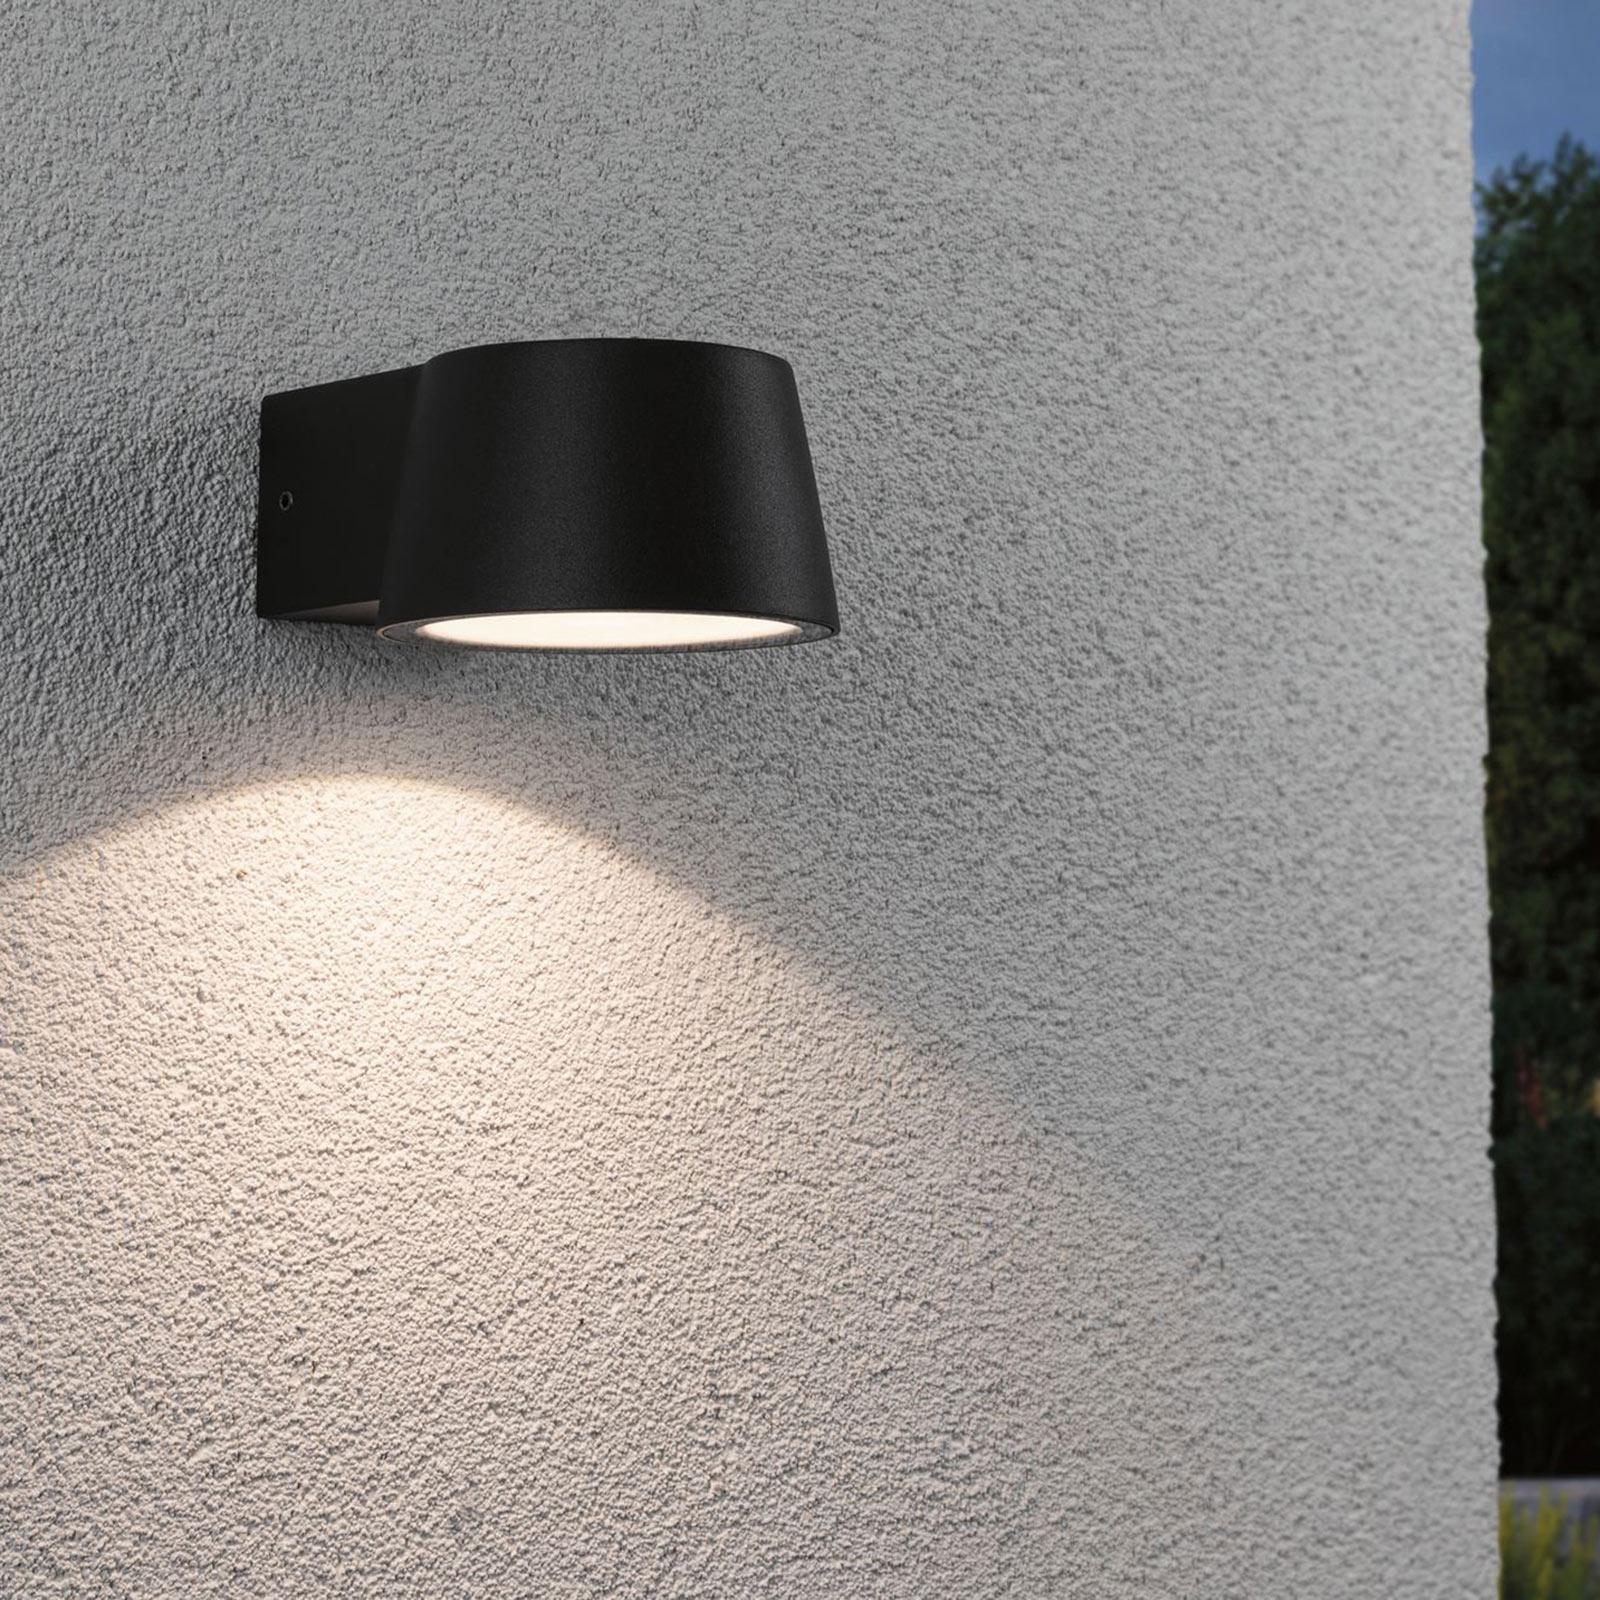 Paulmann Capea kinkiet zewnętrzny LED